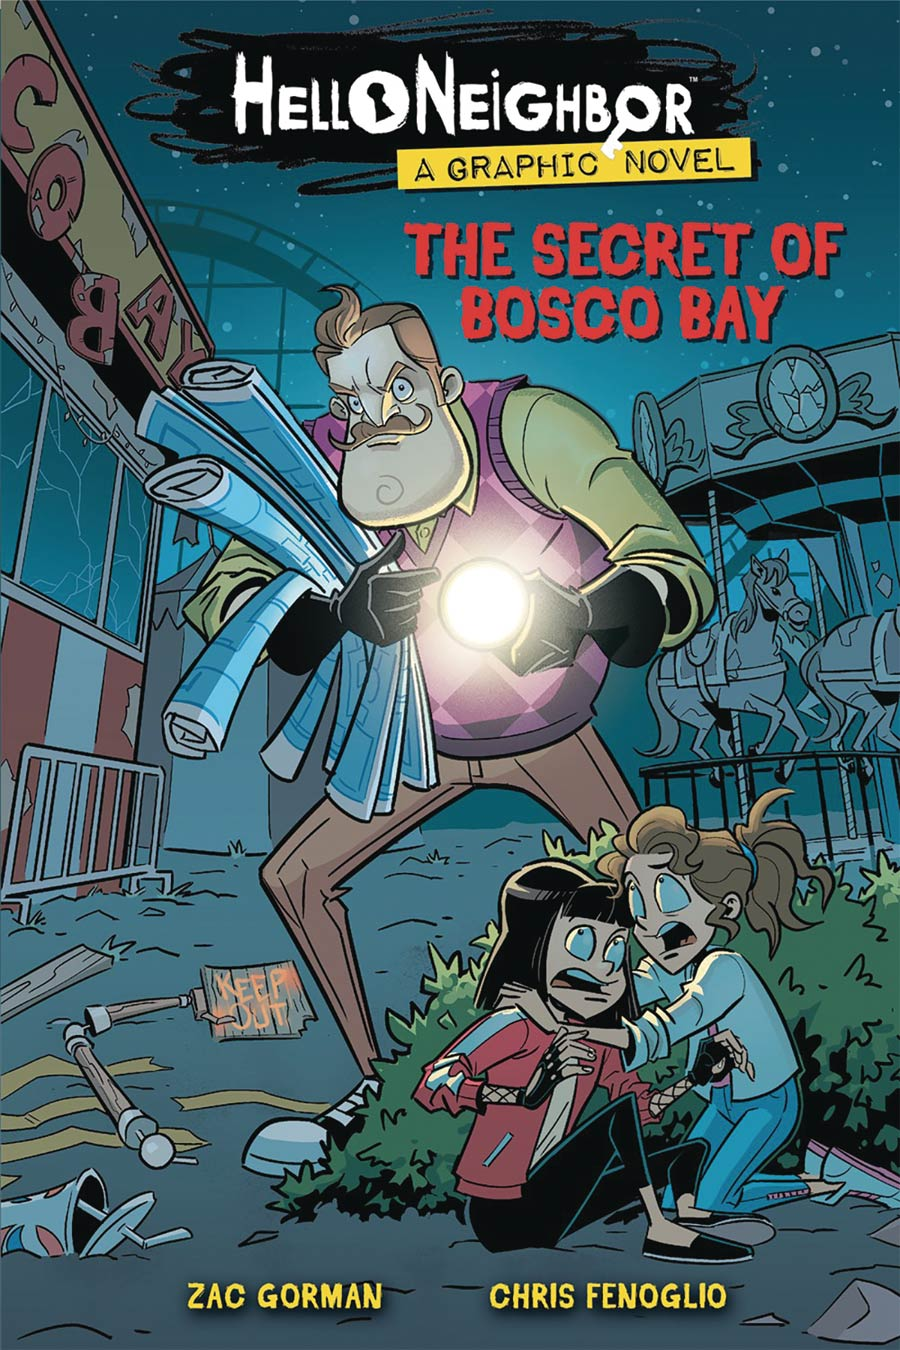 Hello Neighbor Vol 1 Secret Of Bosco Bay TP